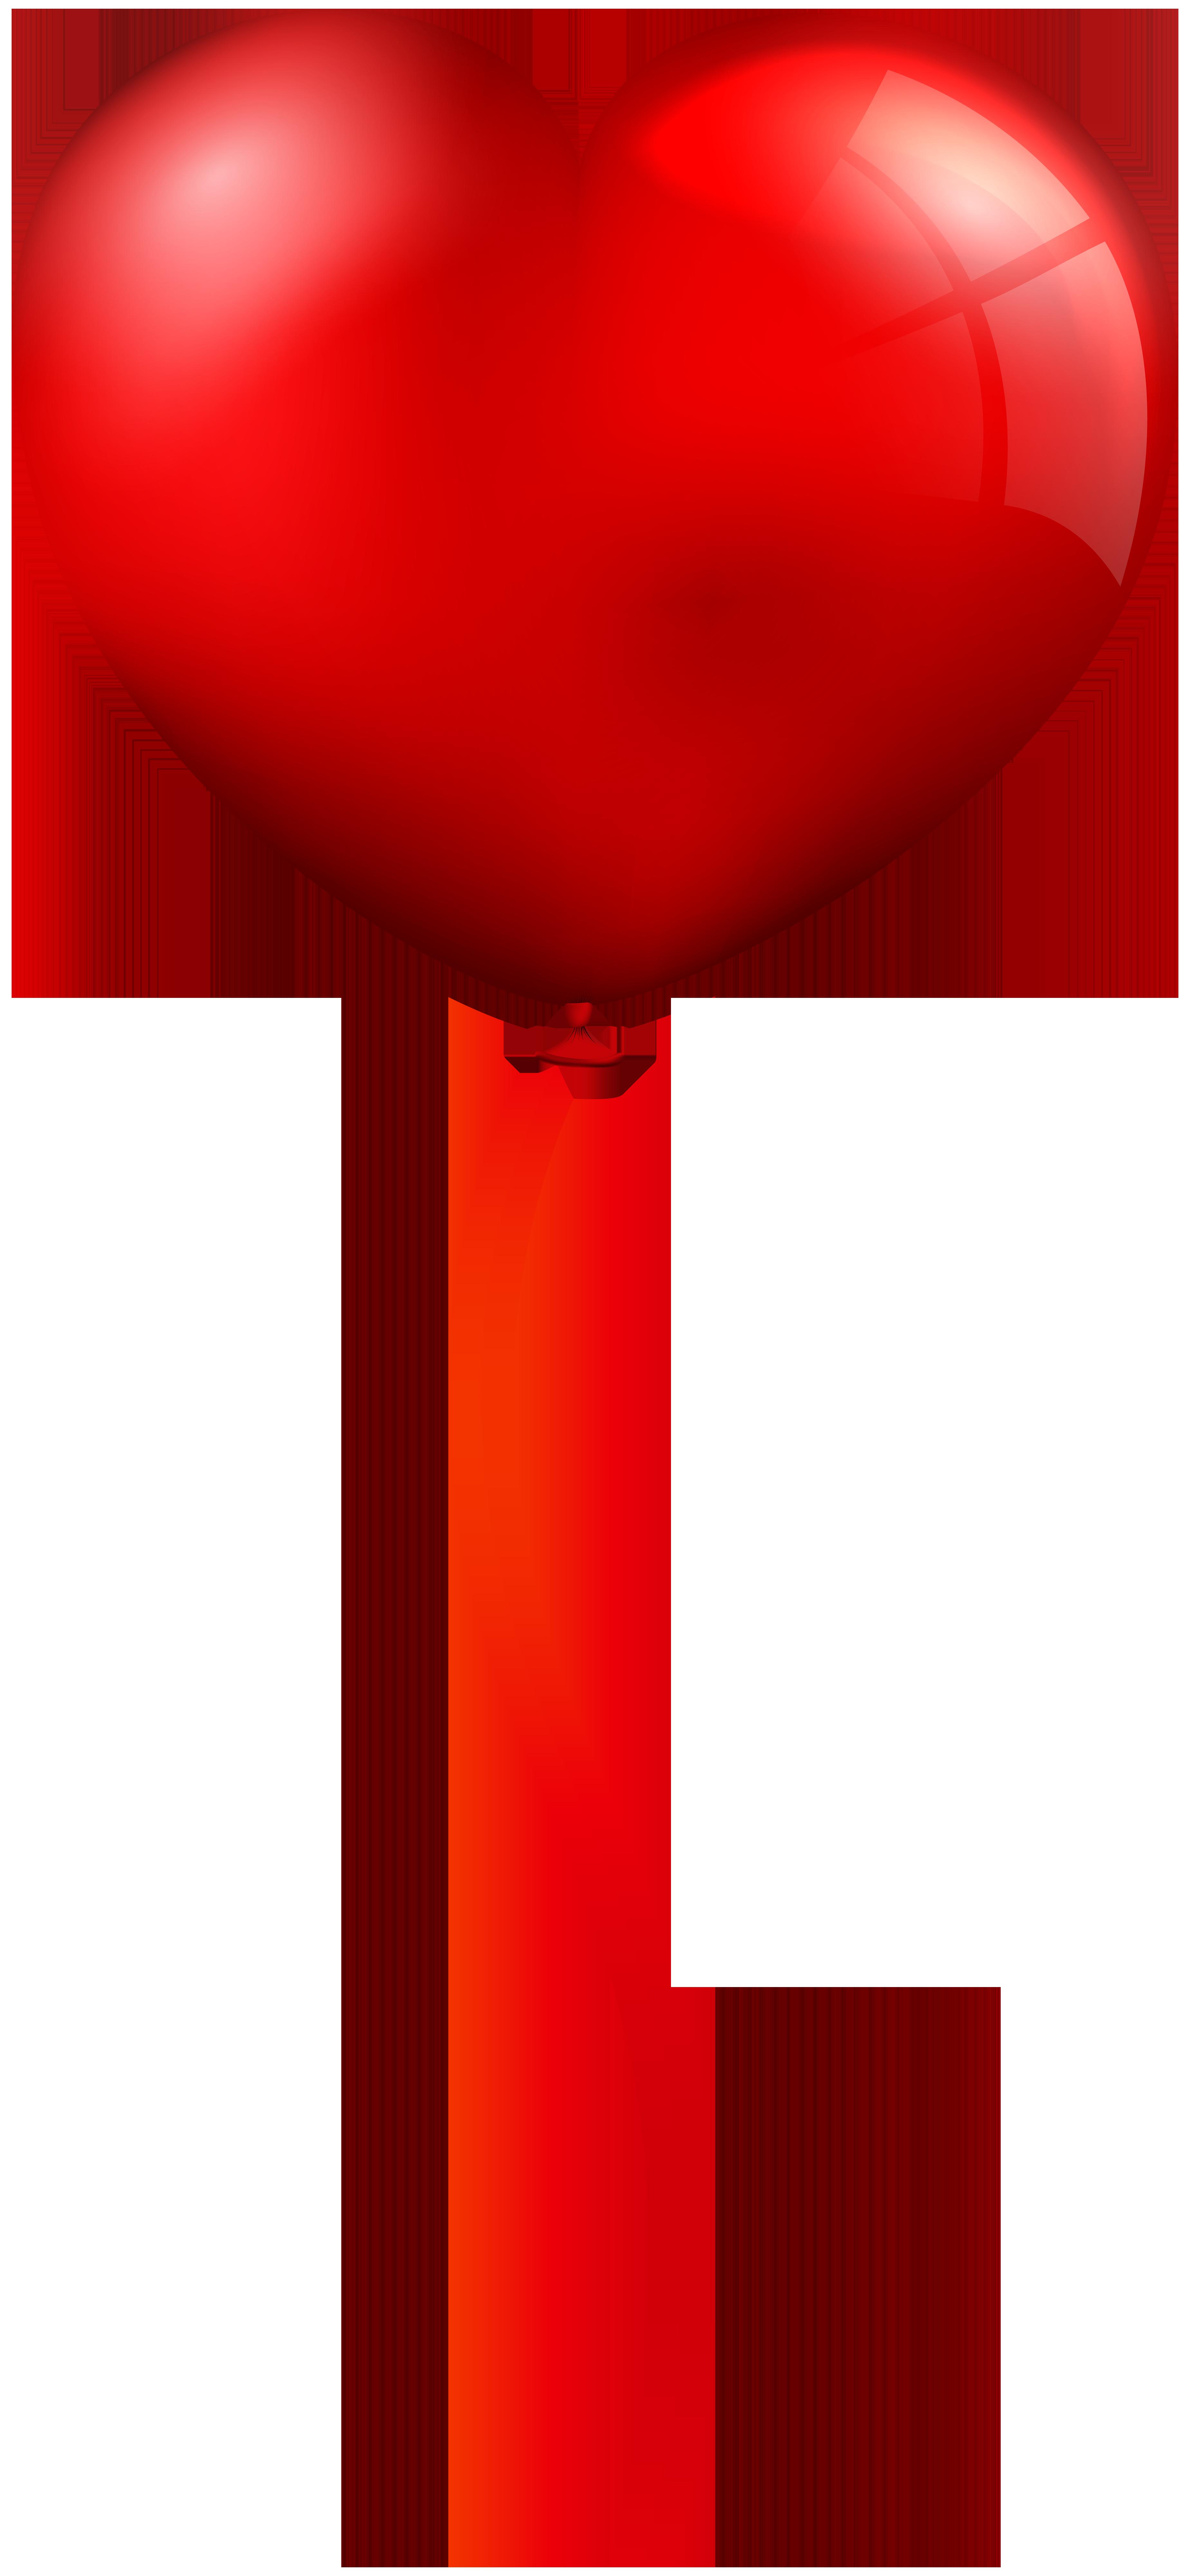 Clipart balloon spring. Red heart clip art